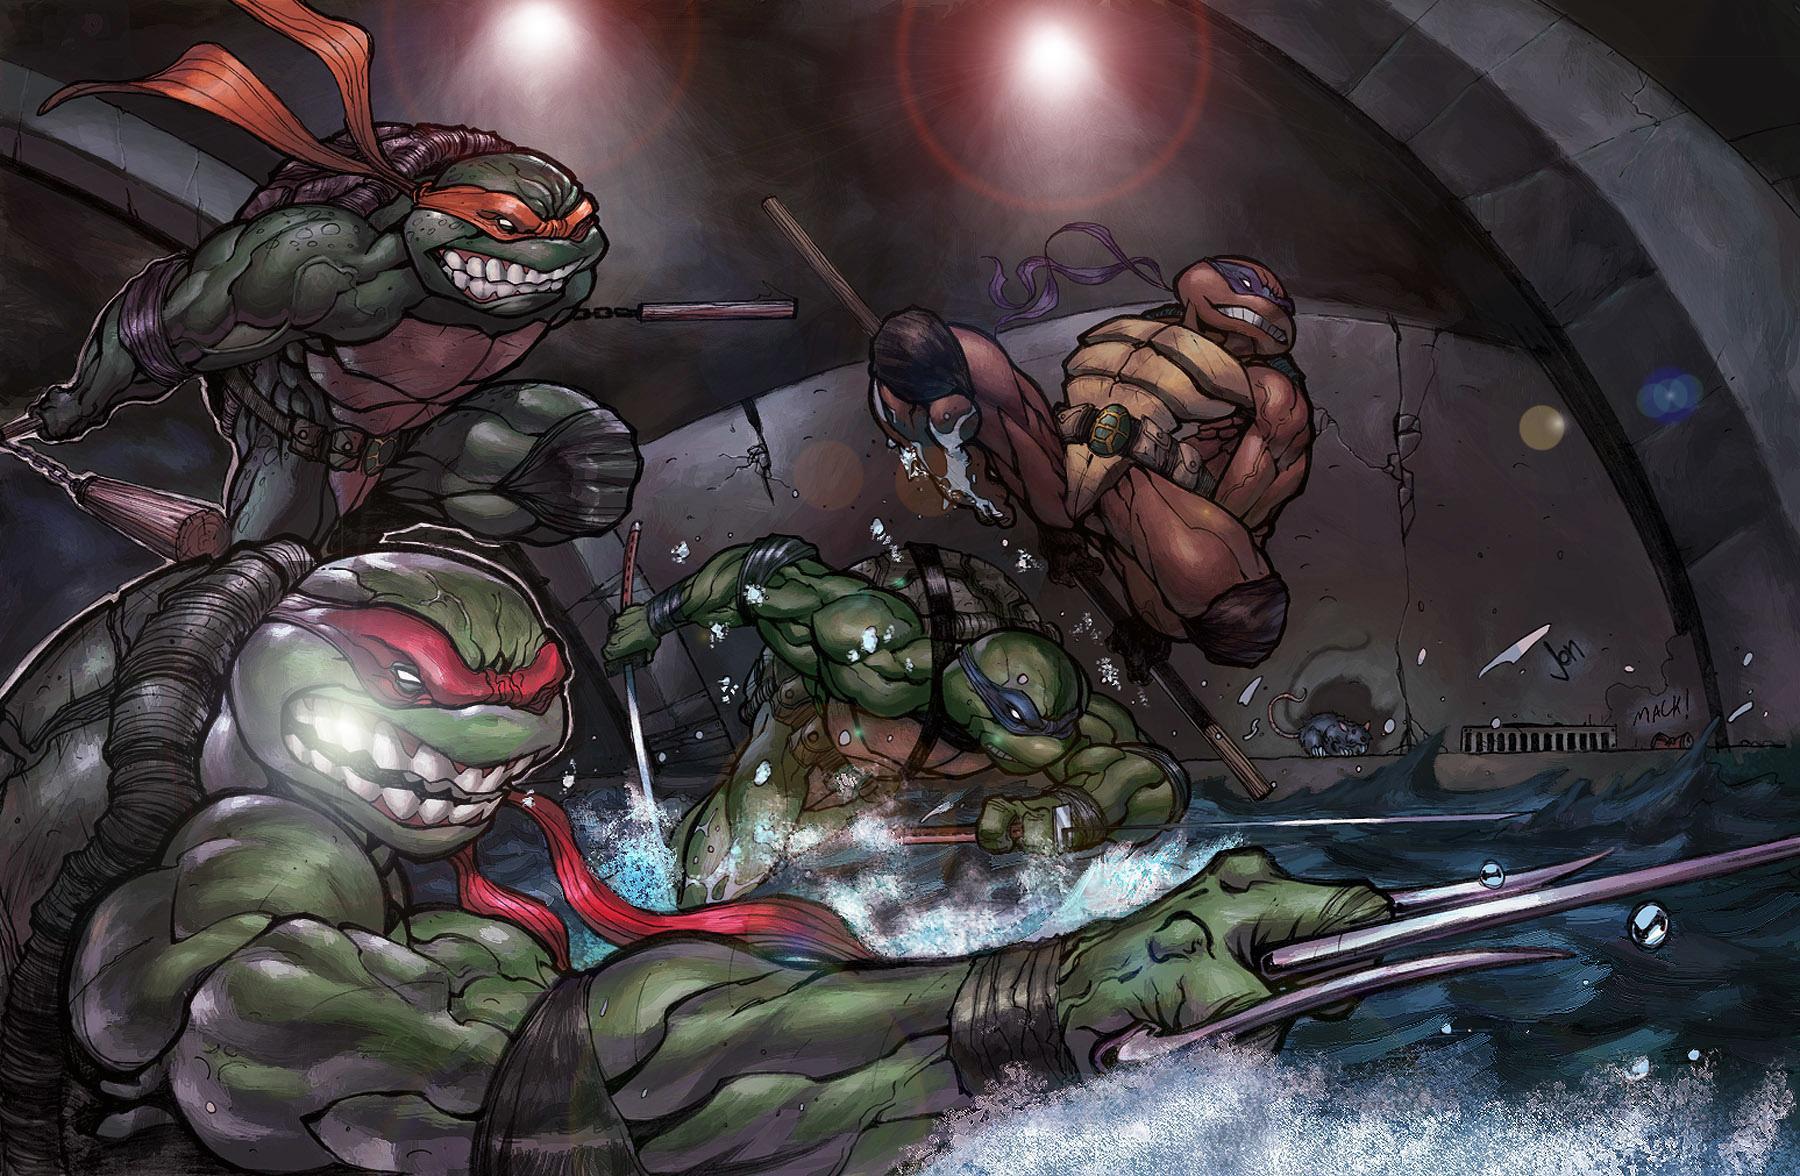 Teenage Mutant Ninja Turtles wallpapers HD quality